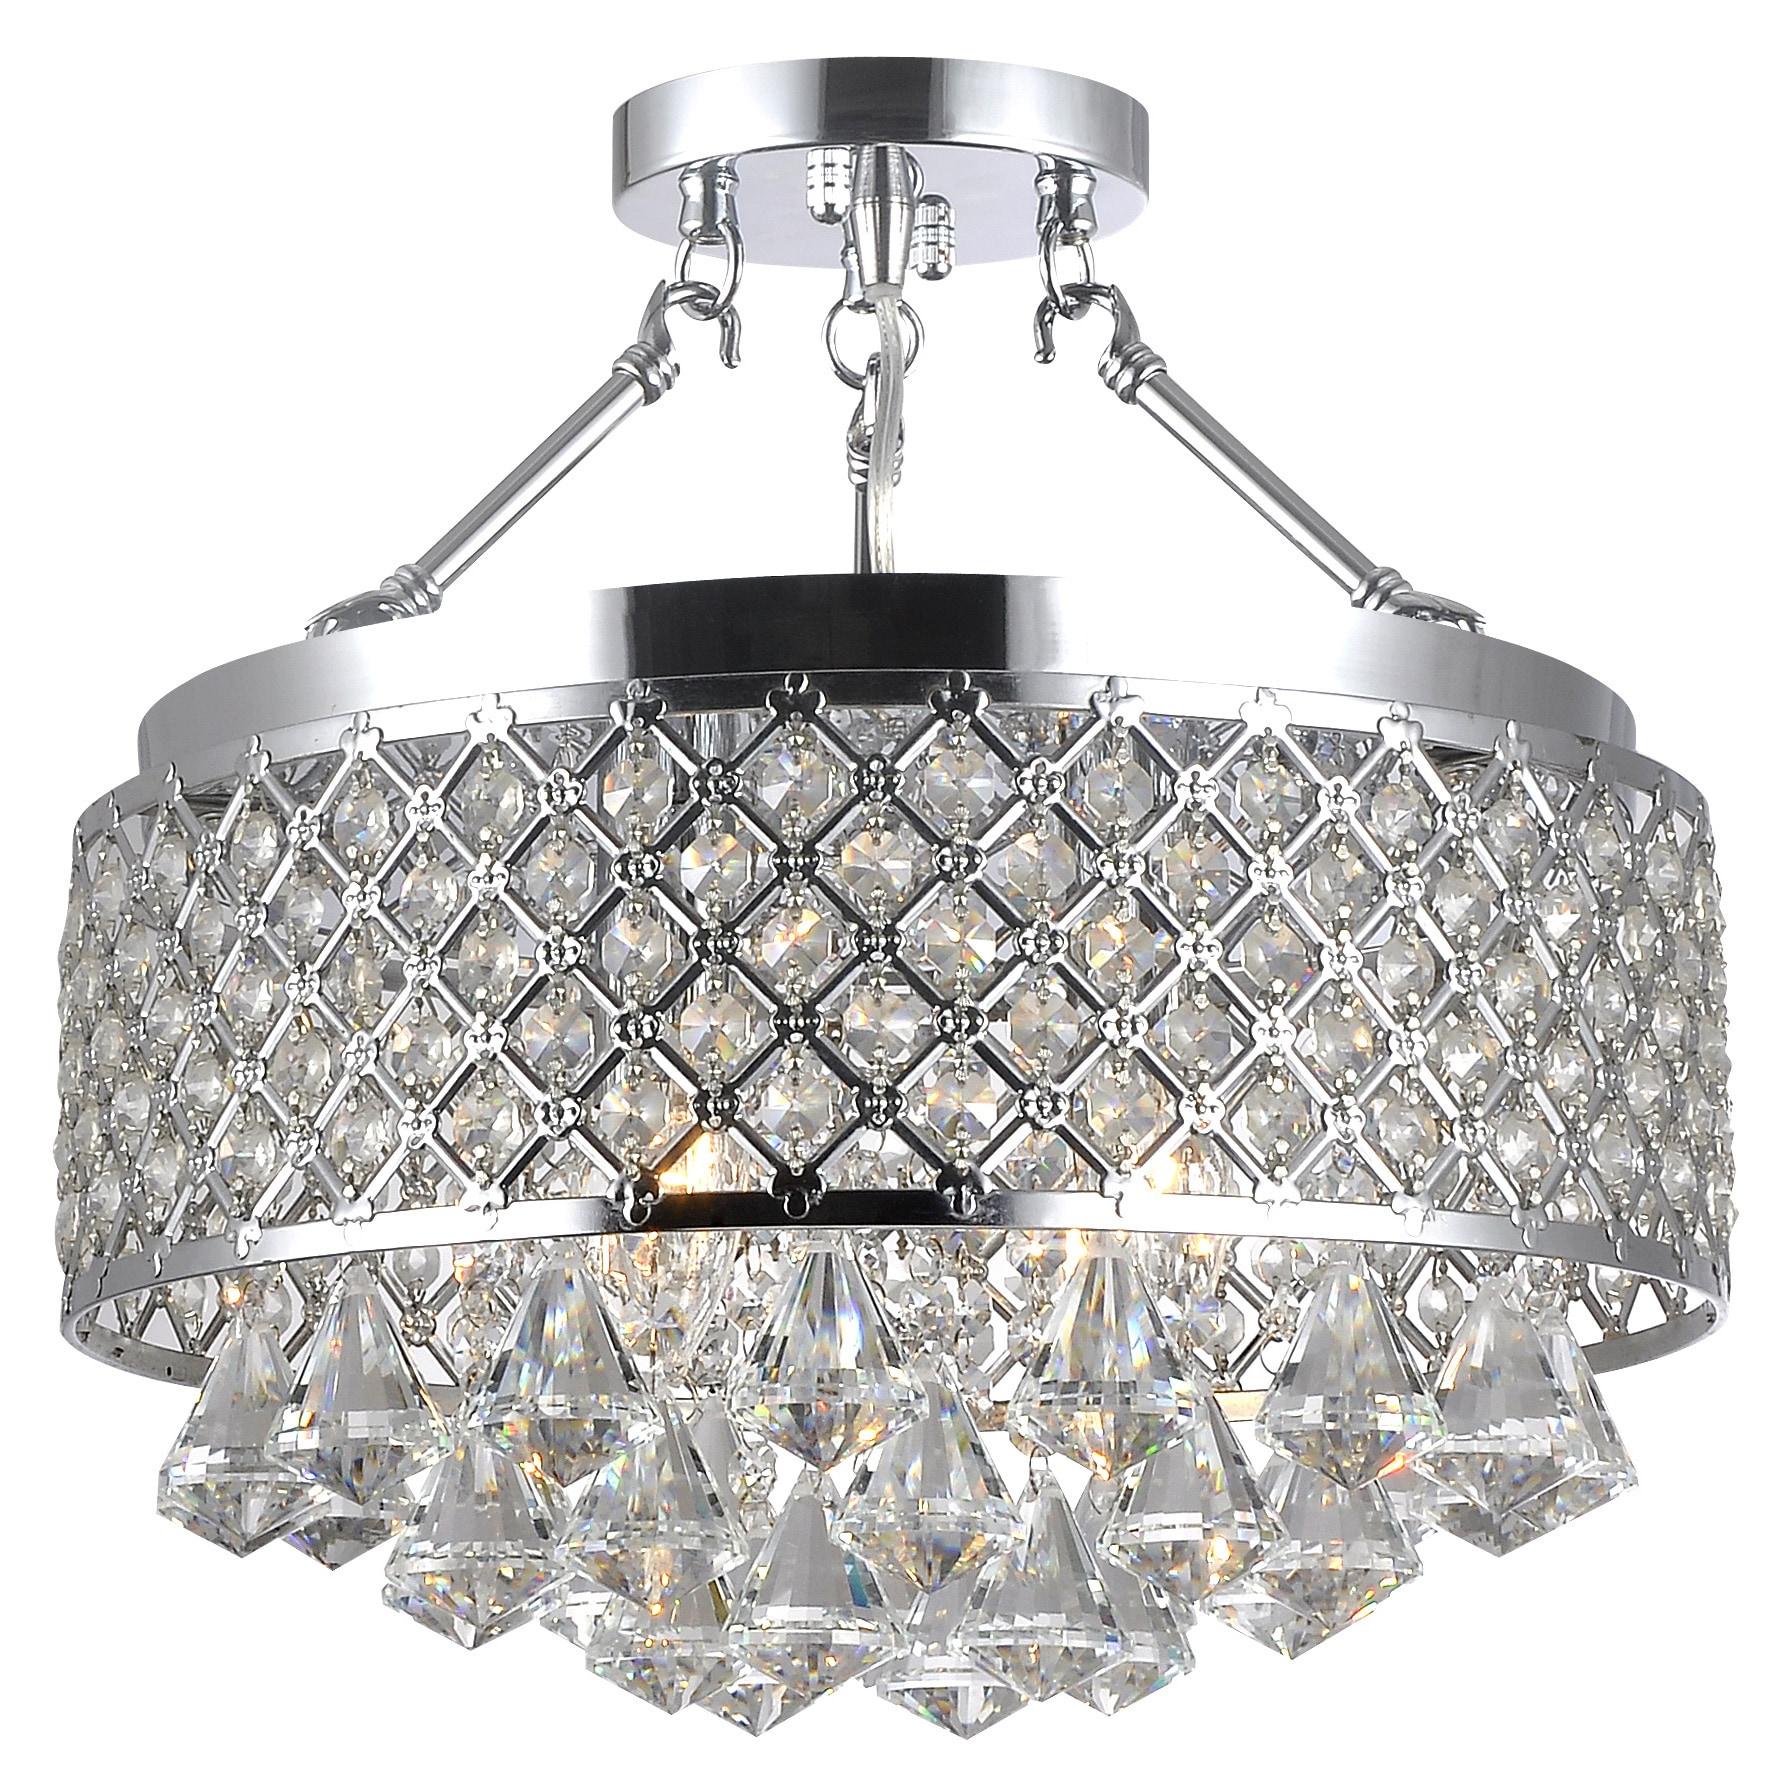 Candice chrome and crystal semi flush mount chandelier free candice chrome and crystal semi flush mount chandelier free shipping today overstock 16649629 arubaitofo Choice Image